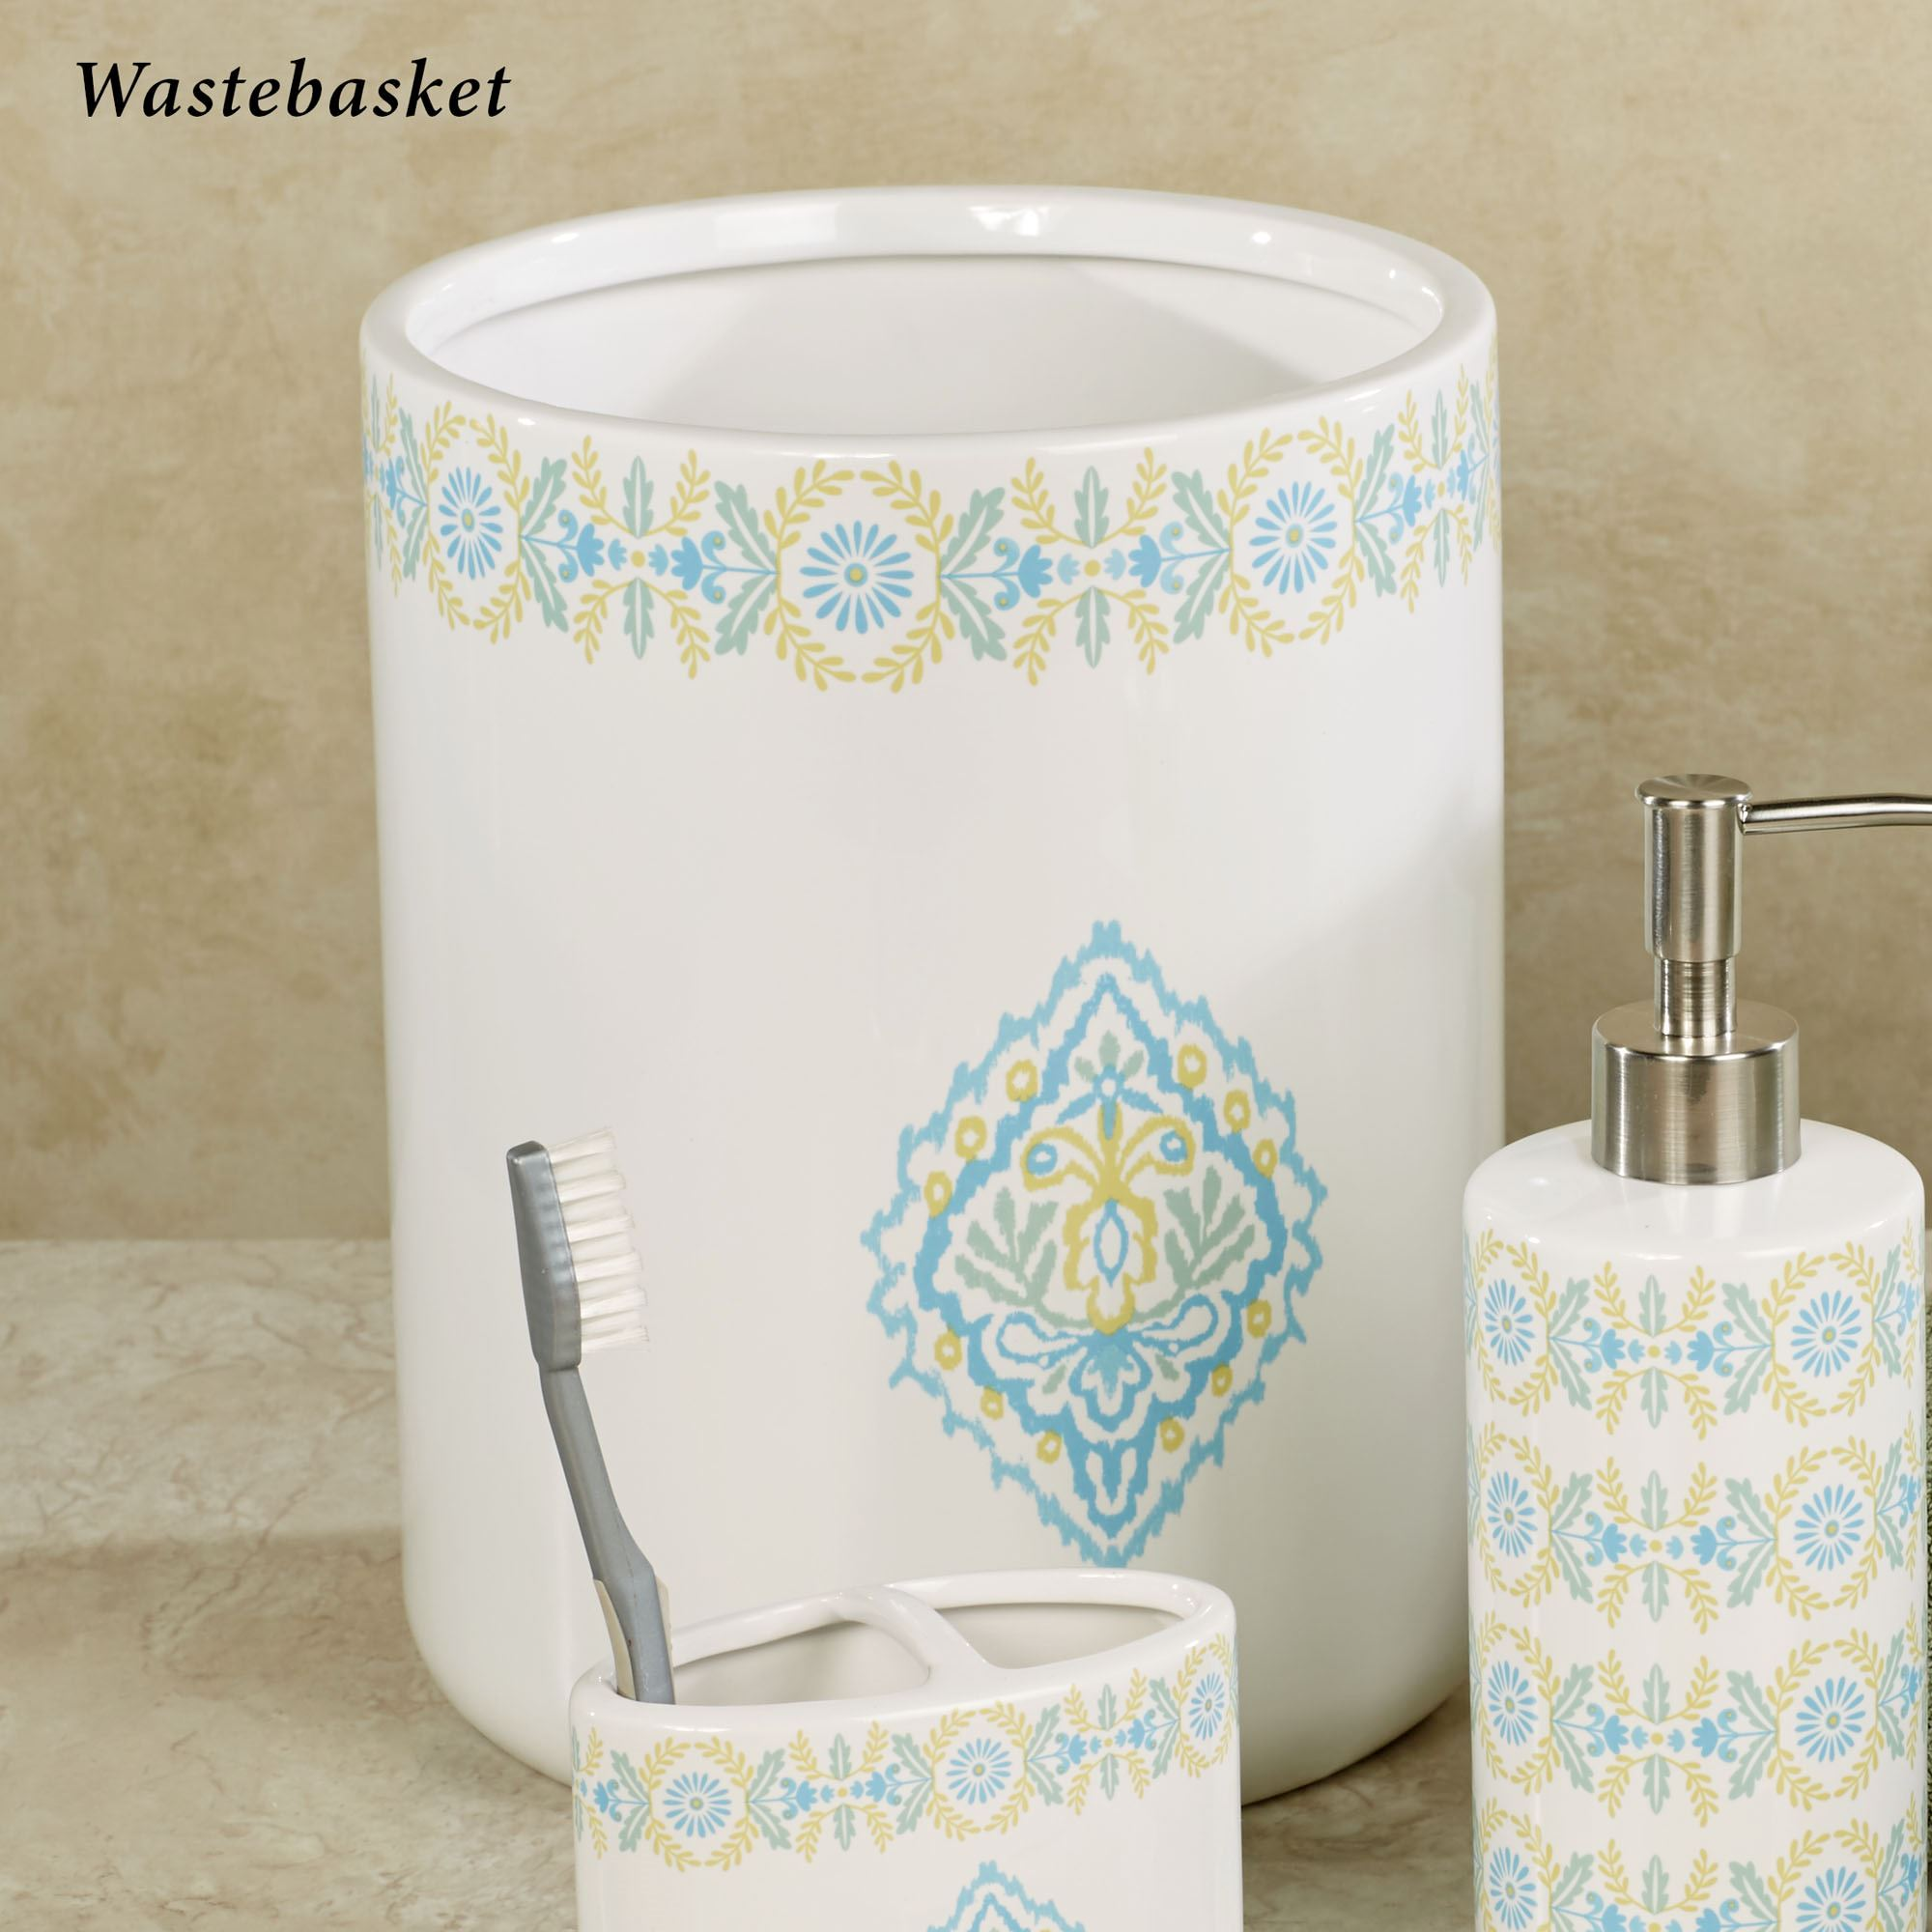 diamond bathroom accessories. Diamond Wastebasket Off White Bathroom Accessories